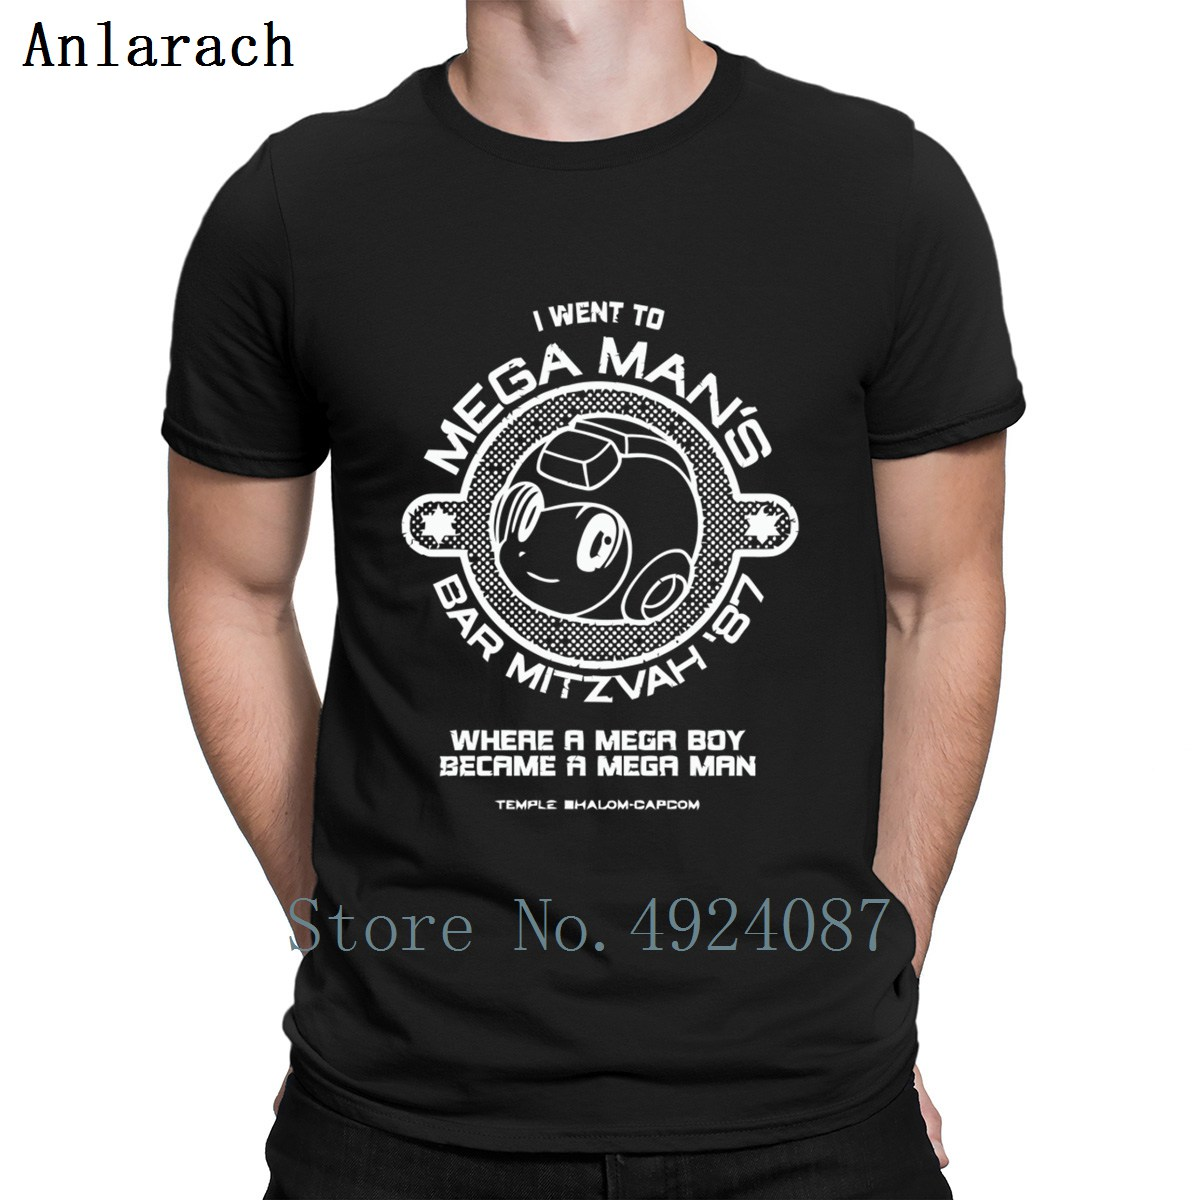 Us 8 12 18 Off Mega Man S Bar Mitzvah Drawstring Bag T Shirt Create Fitness Clothing Custom Tshirt Free Shipping Natural Summer Style Cotton In